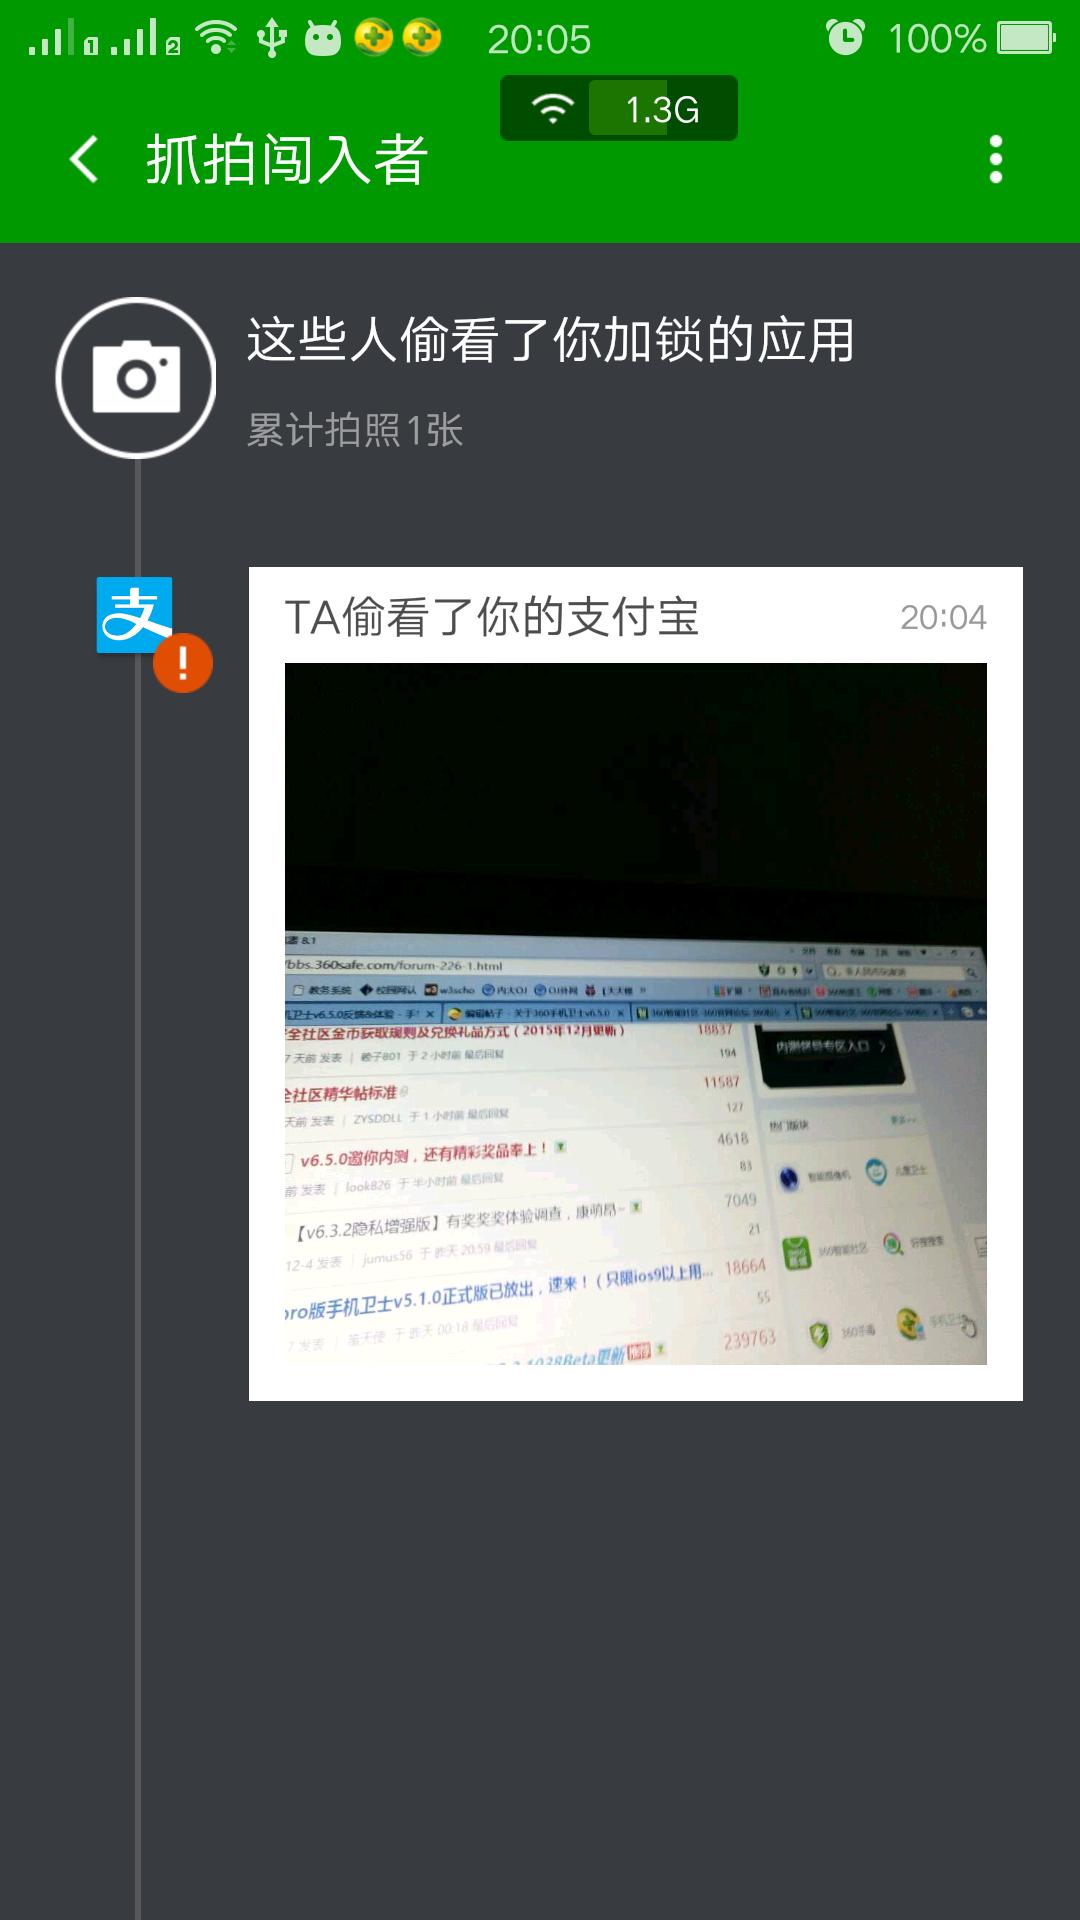 Screenshot_2015-12-22-20-05-03-180.png